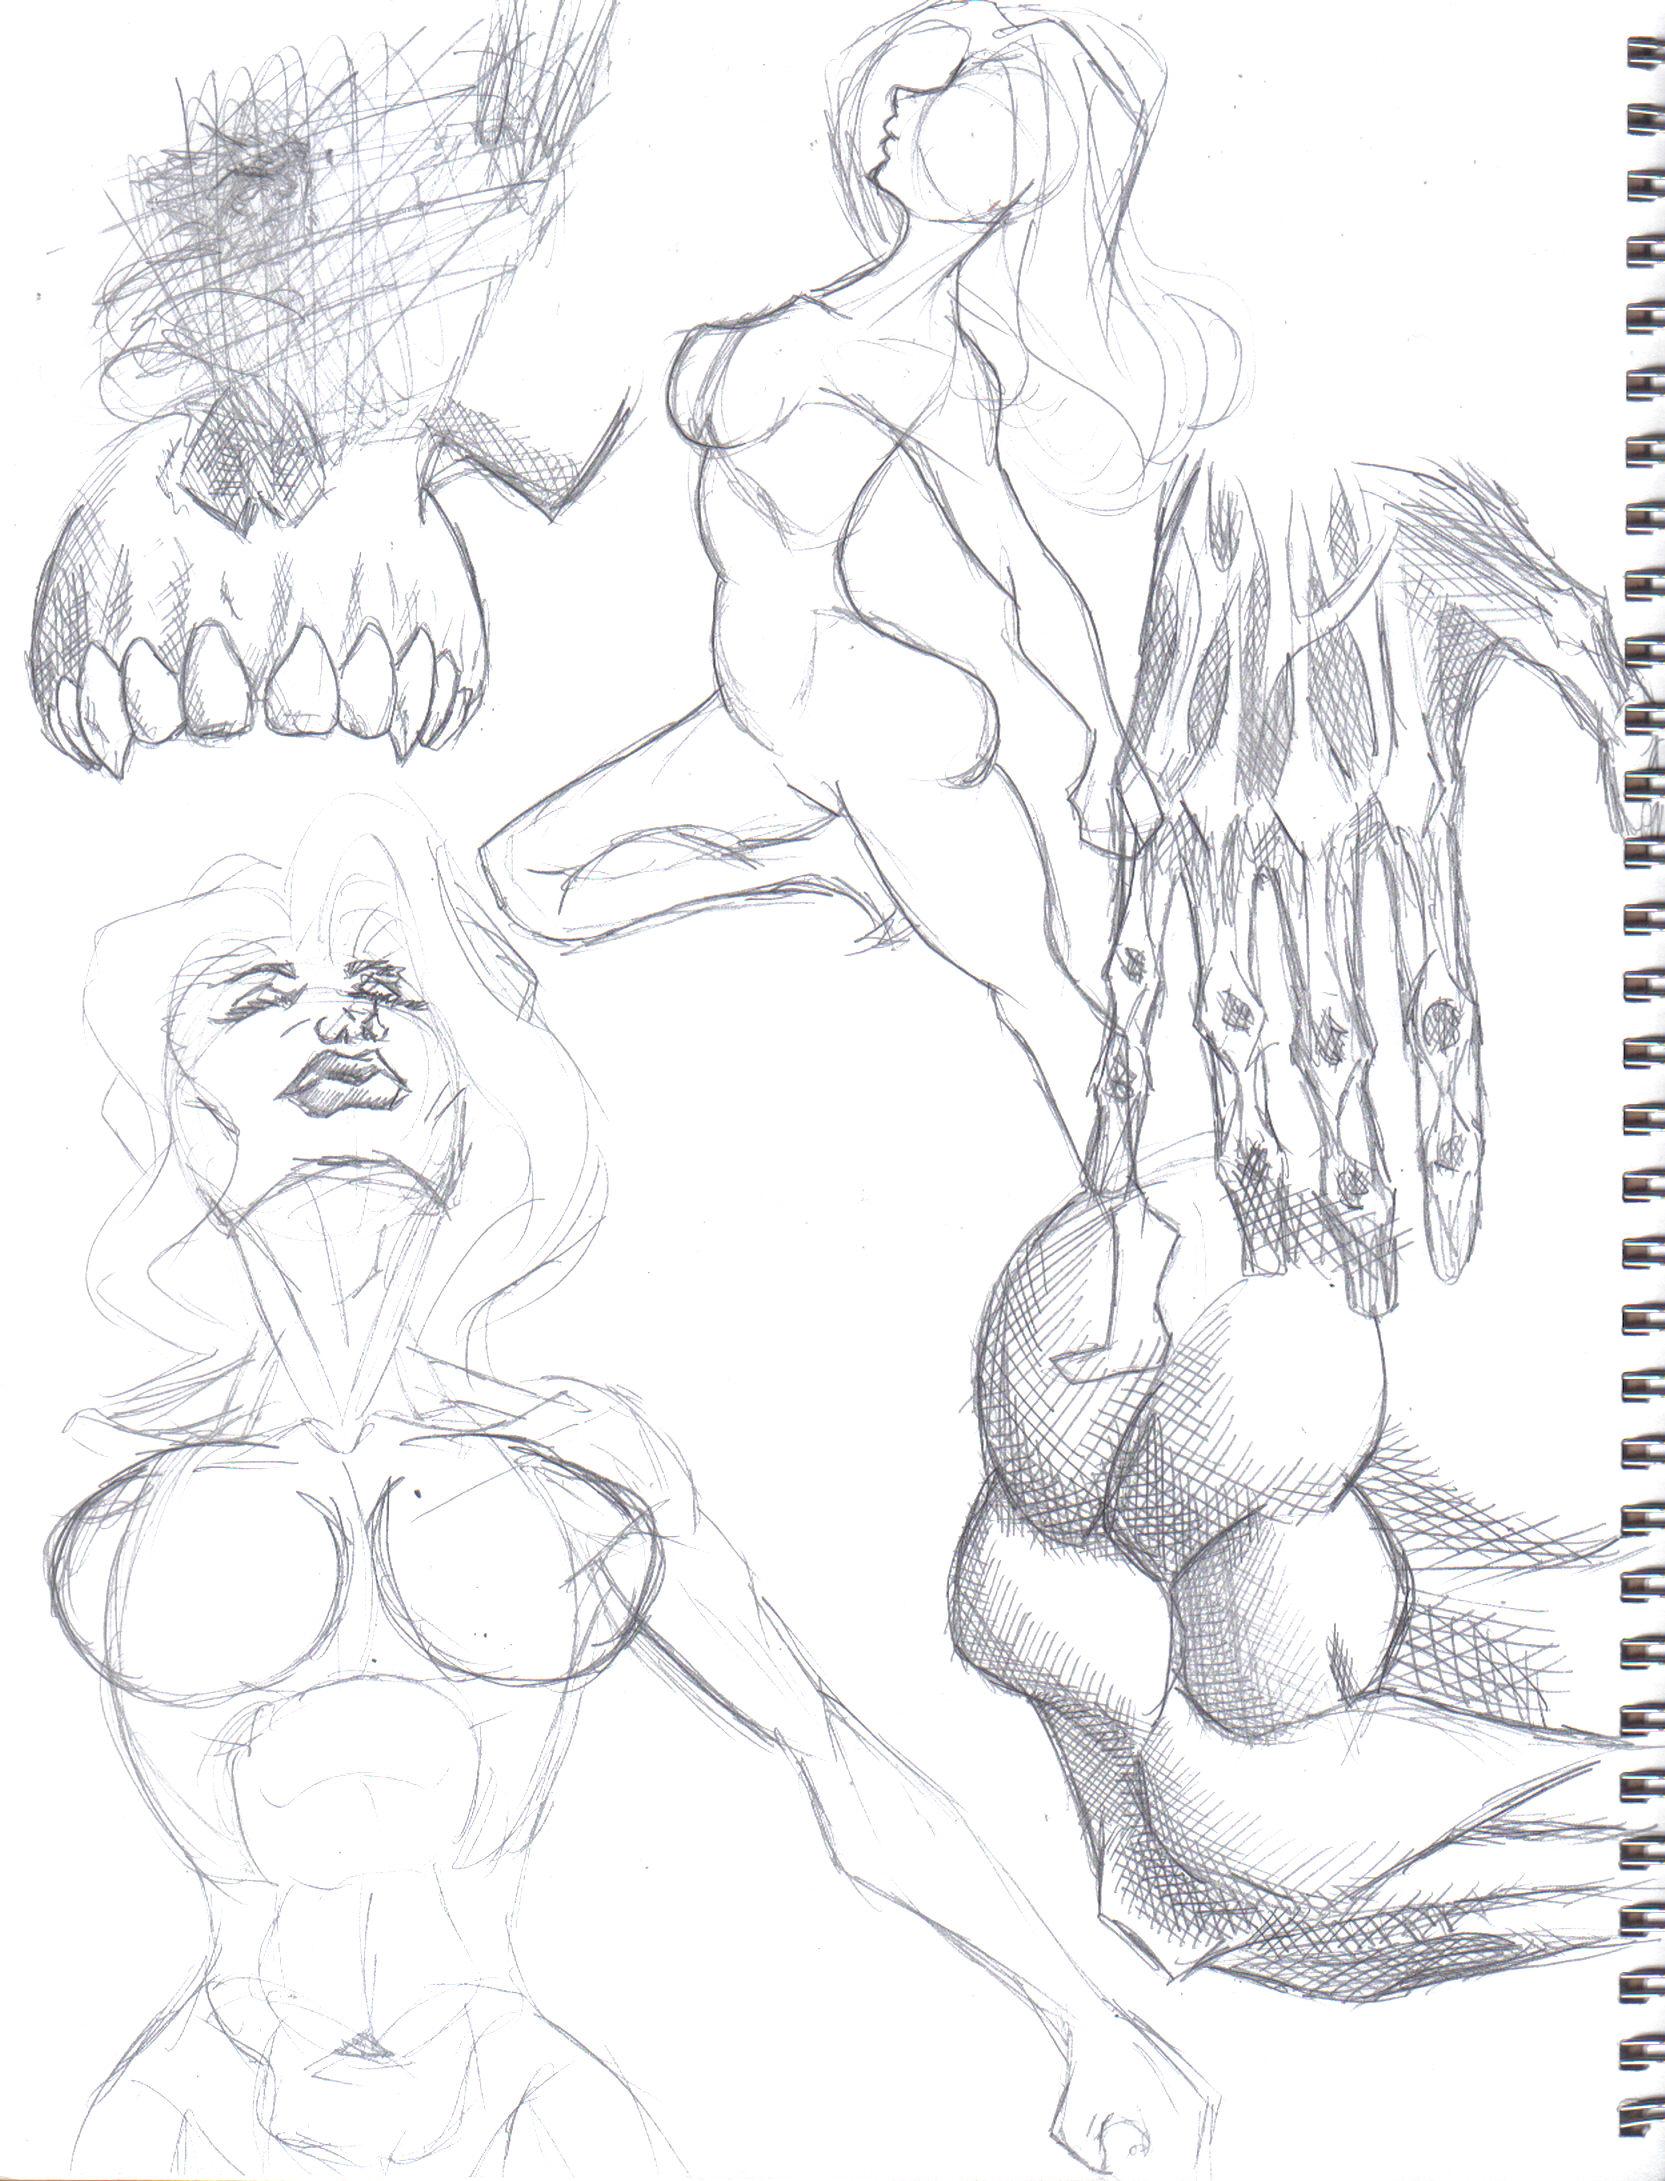 Random Sketches 1 by KingVego